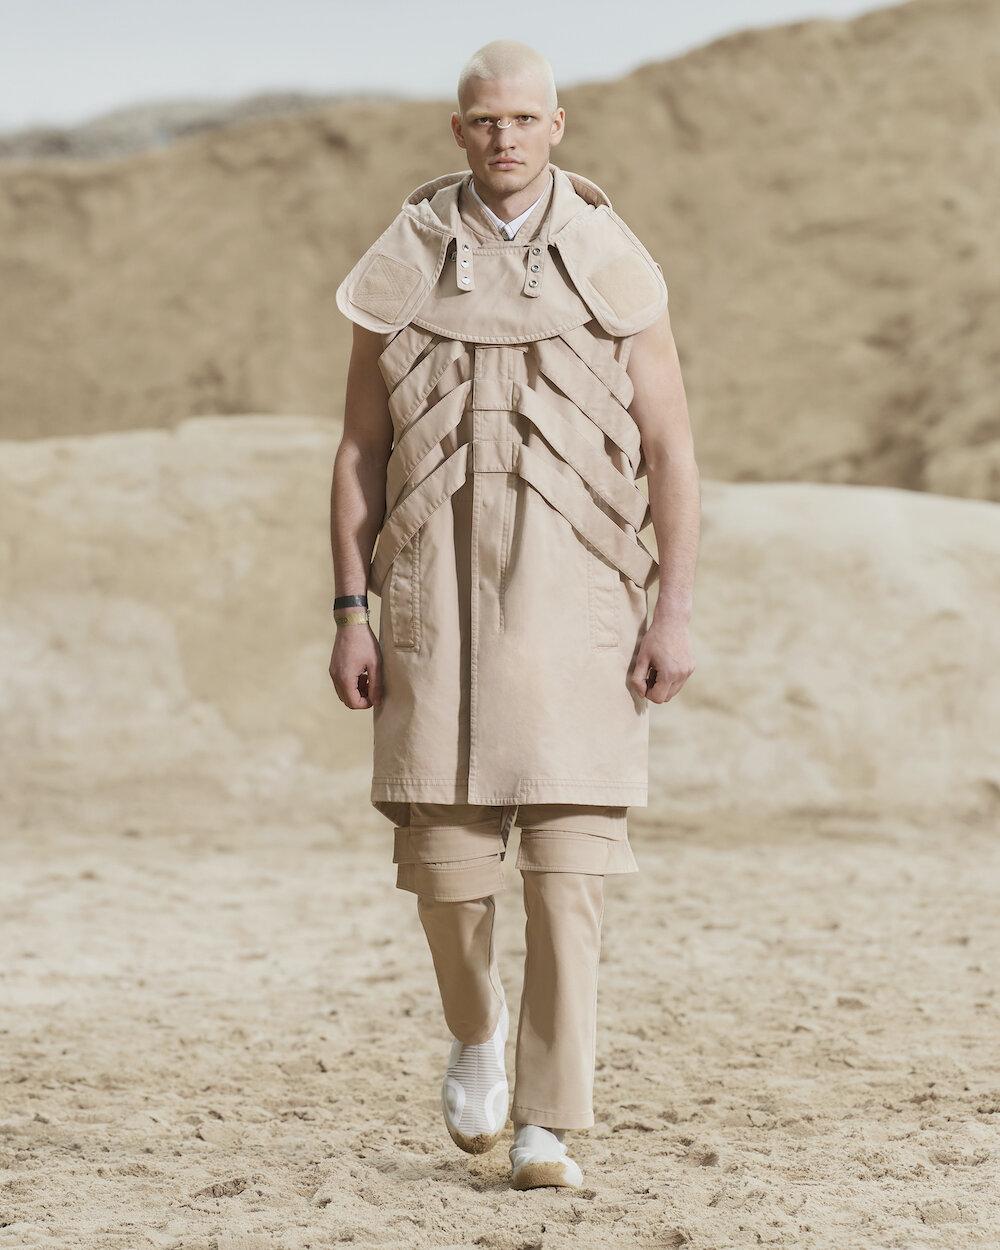 Burberry Spring_Summer 2022 Menswear Presentation Collection - Look 19 - Daniil.jpg